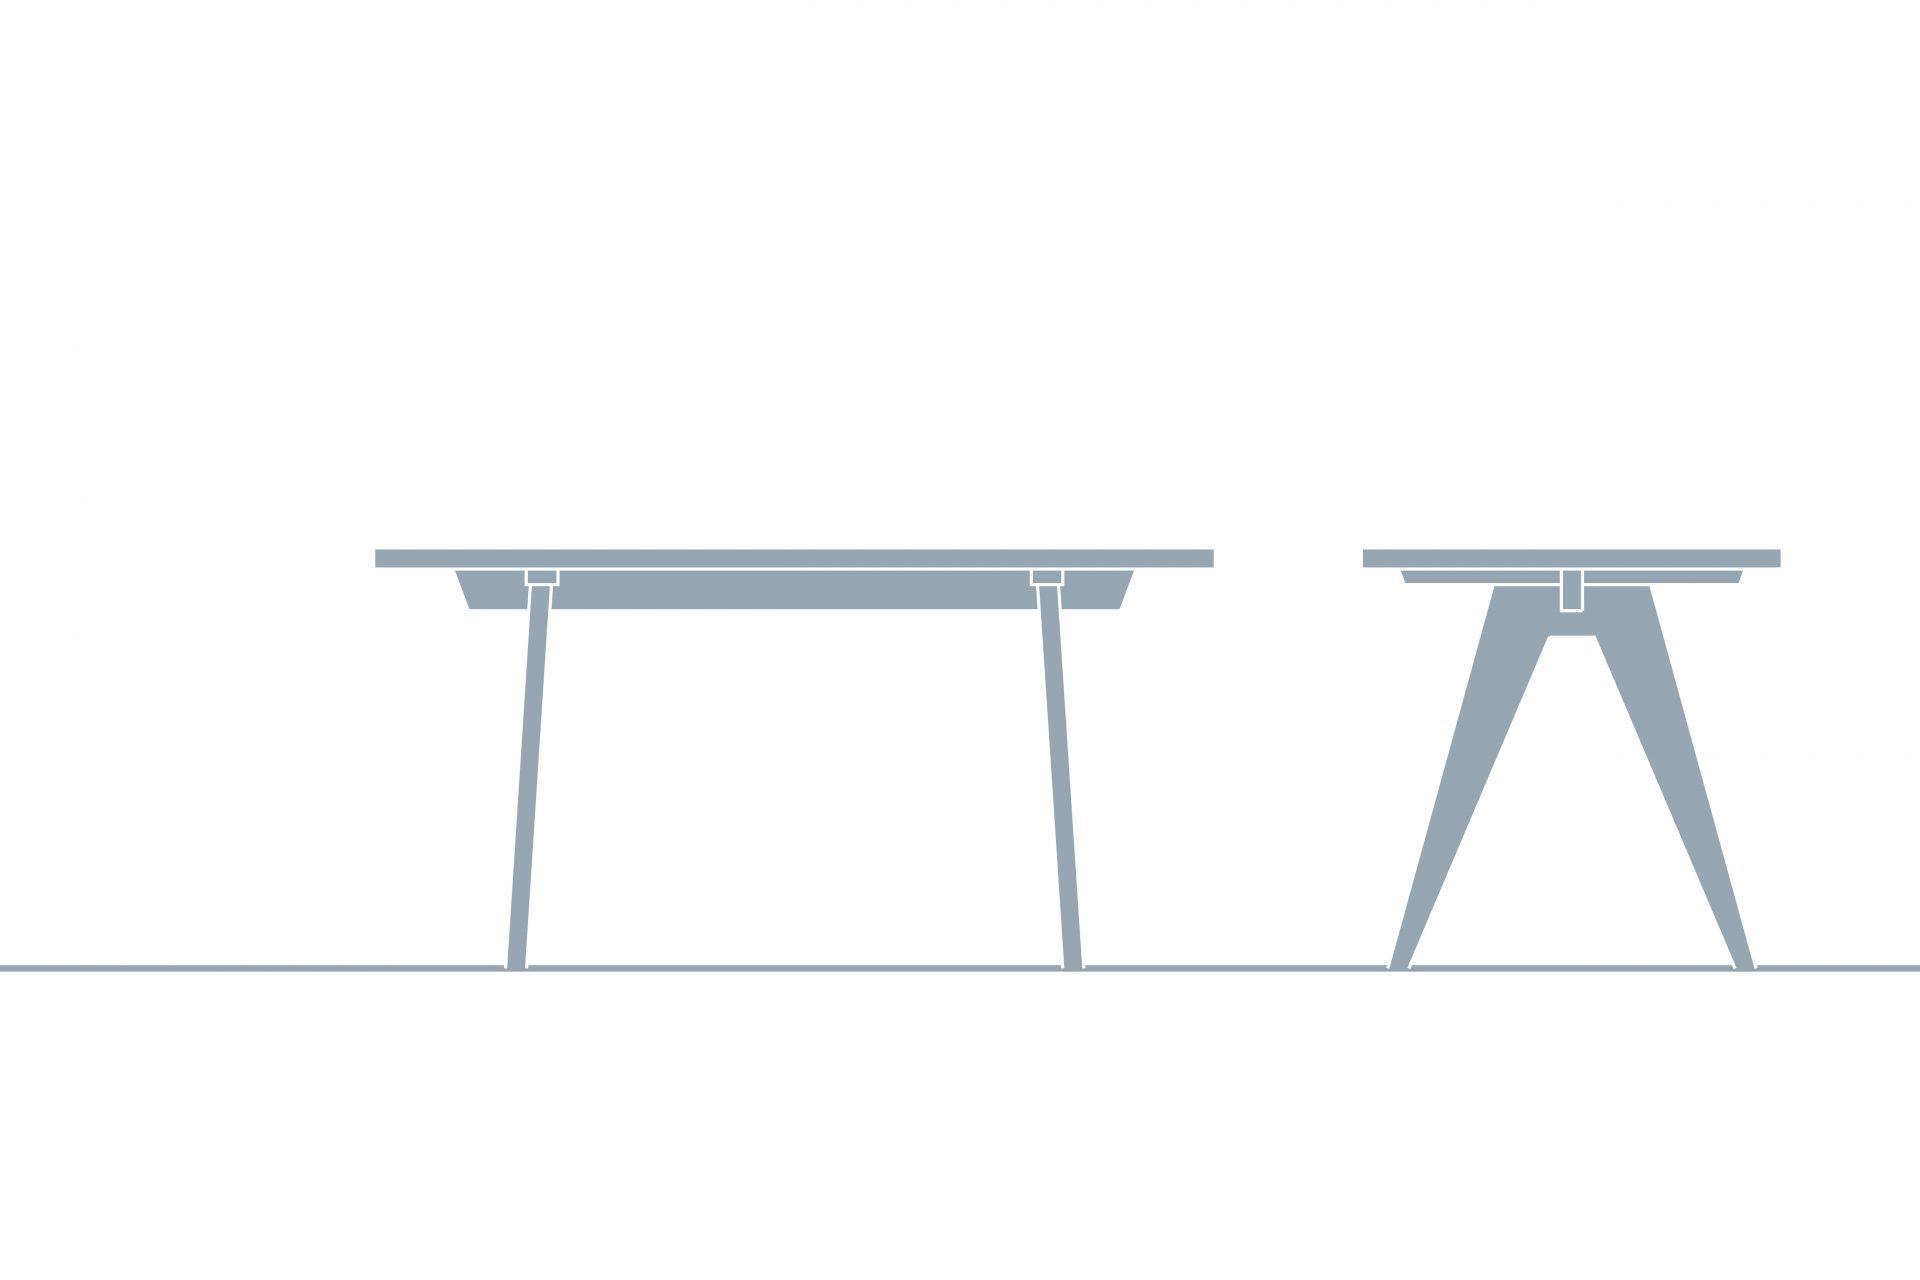 pasquali-alessandro-design-tavolo-noce-vallarsa